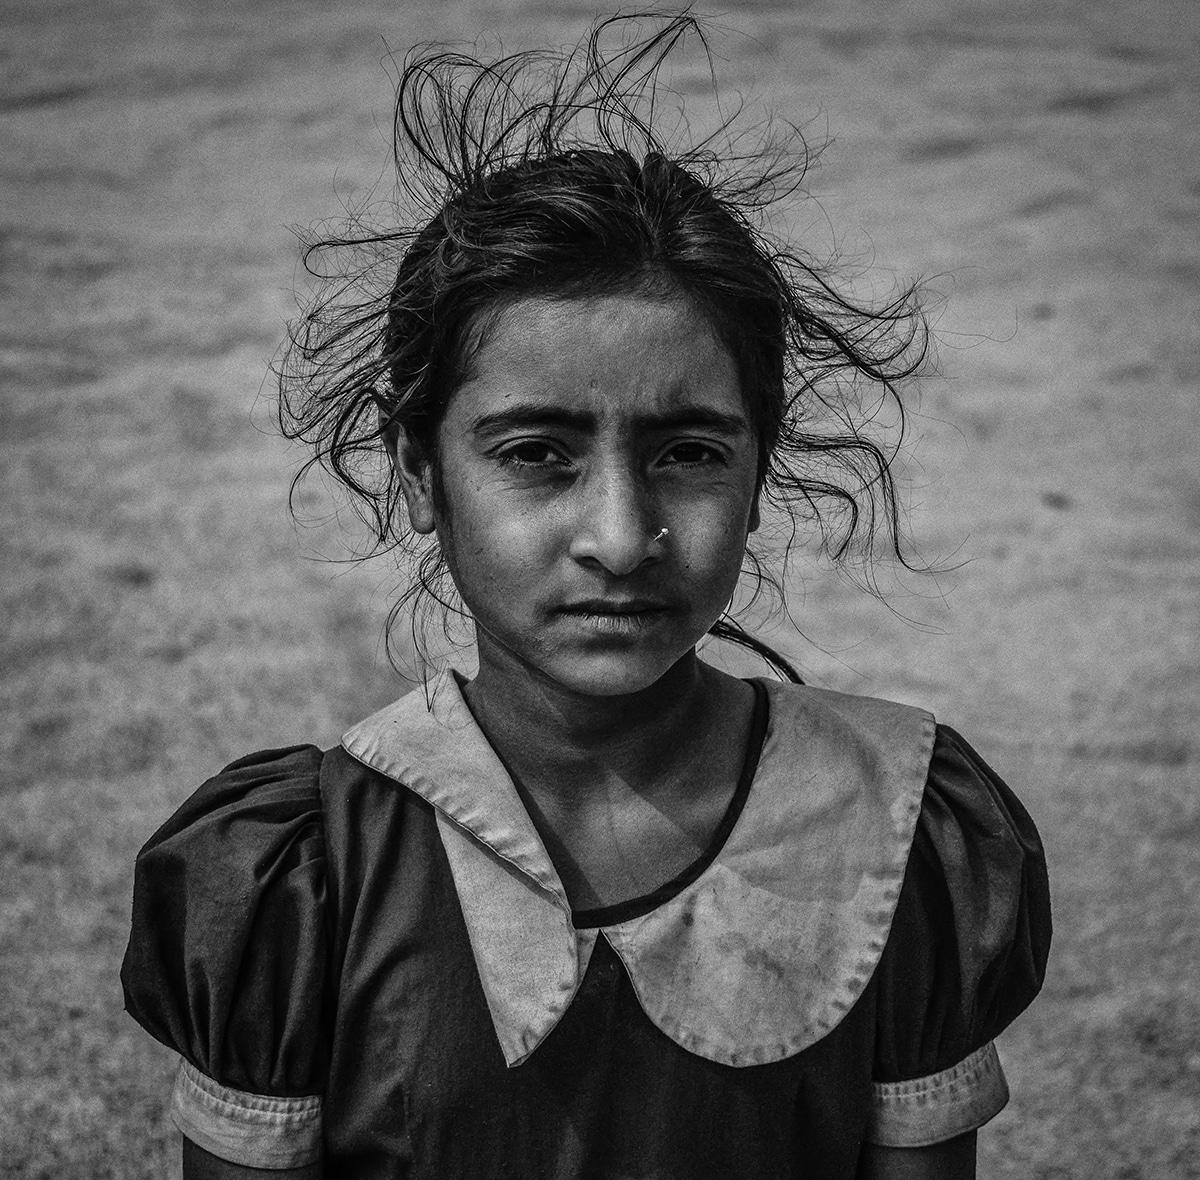 «To όνομα της είναι Τσάντι» ονομάζεται η φωτογραφία ενός νεαρού κοριτσιού που εργάζεται με τους γονείς της σε έναν ορυζώνα στο Μπαγκλαντές έτσι ώστε να συγκεντρωθούν χρήματα όχι μόνο για να ζήσουν αλλά και για να μην σταματήσει το σχολείο.